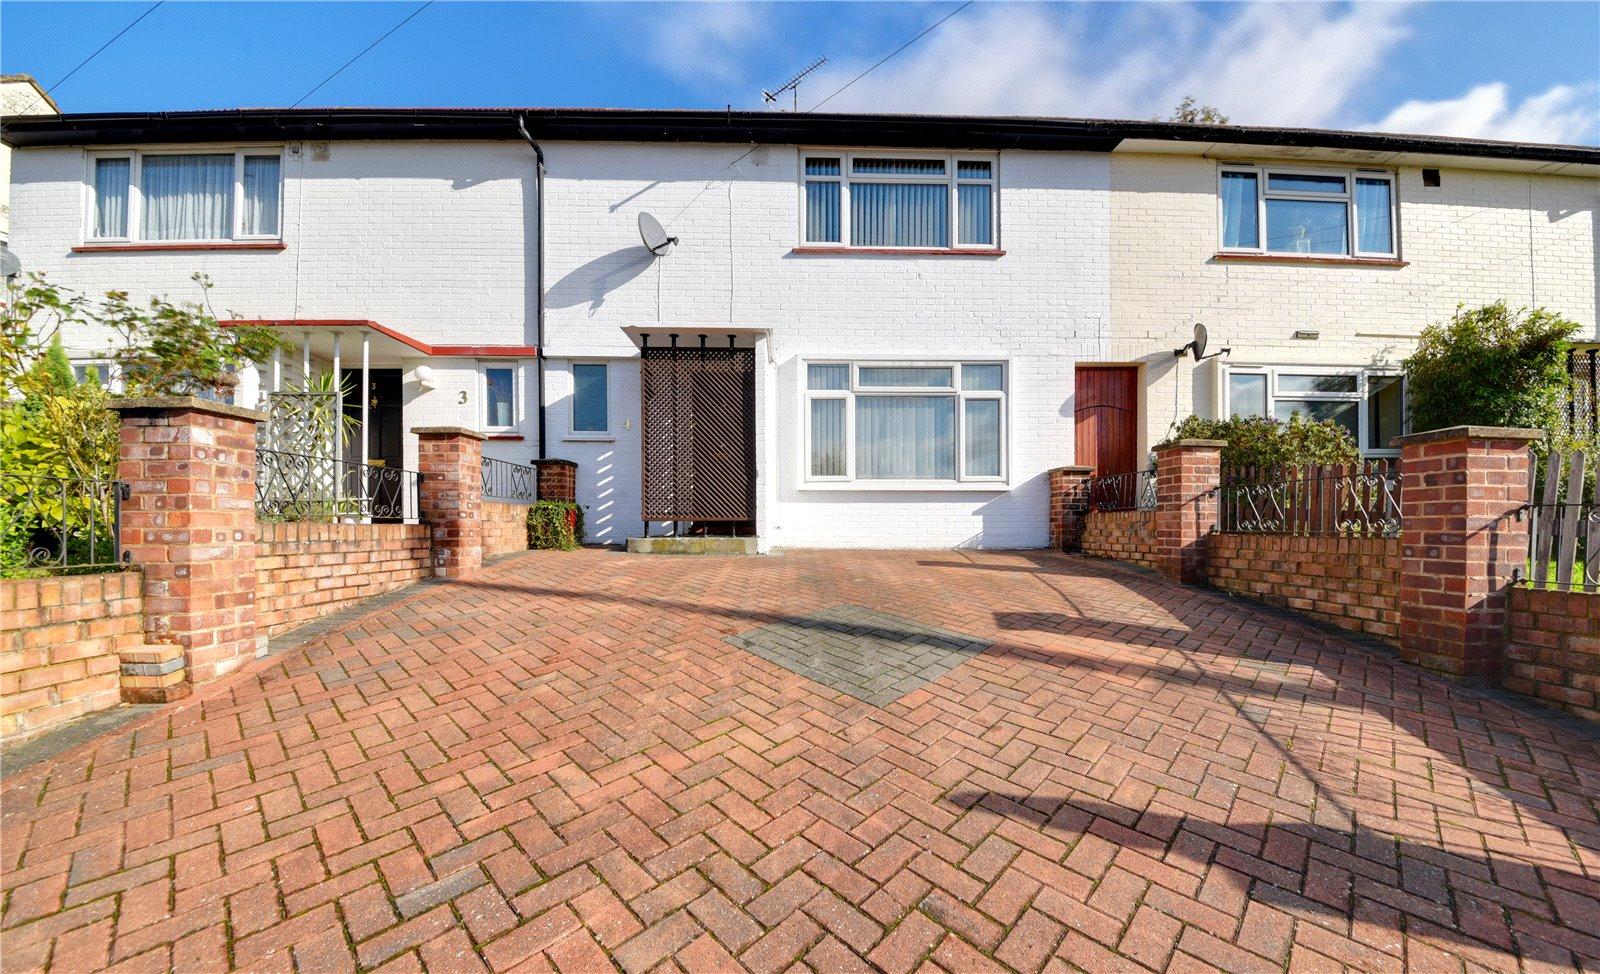 2 bed house for sale in Arkley, EN5 3DW  - Property Image 3